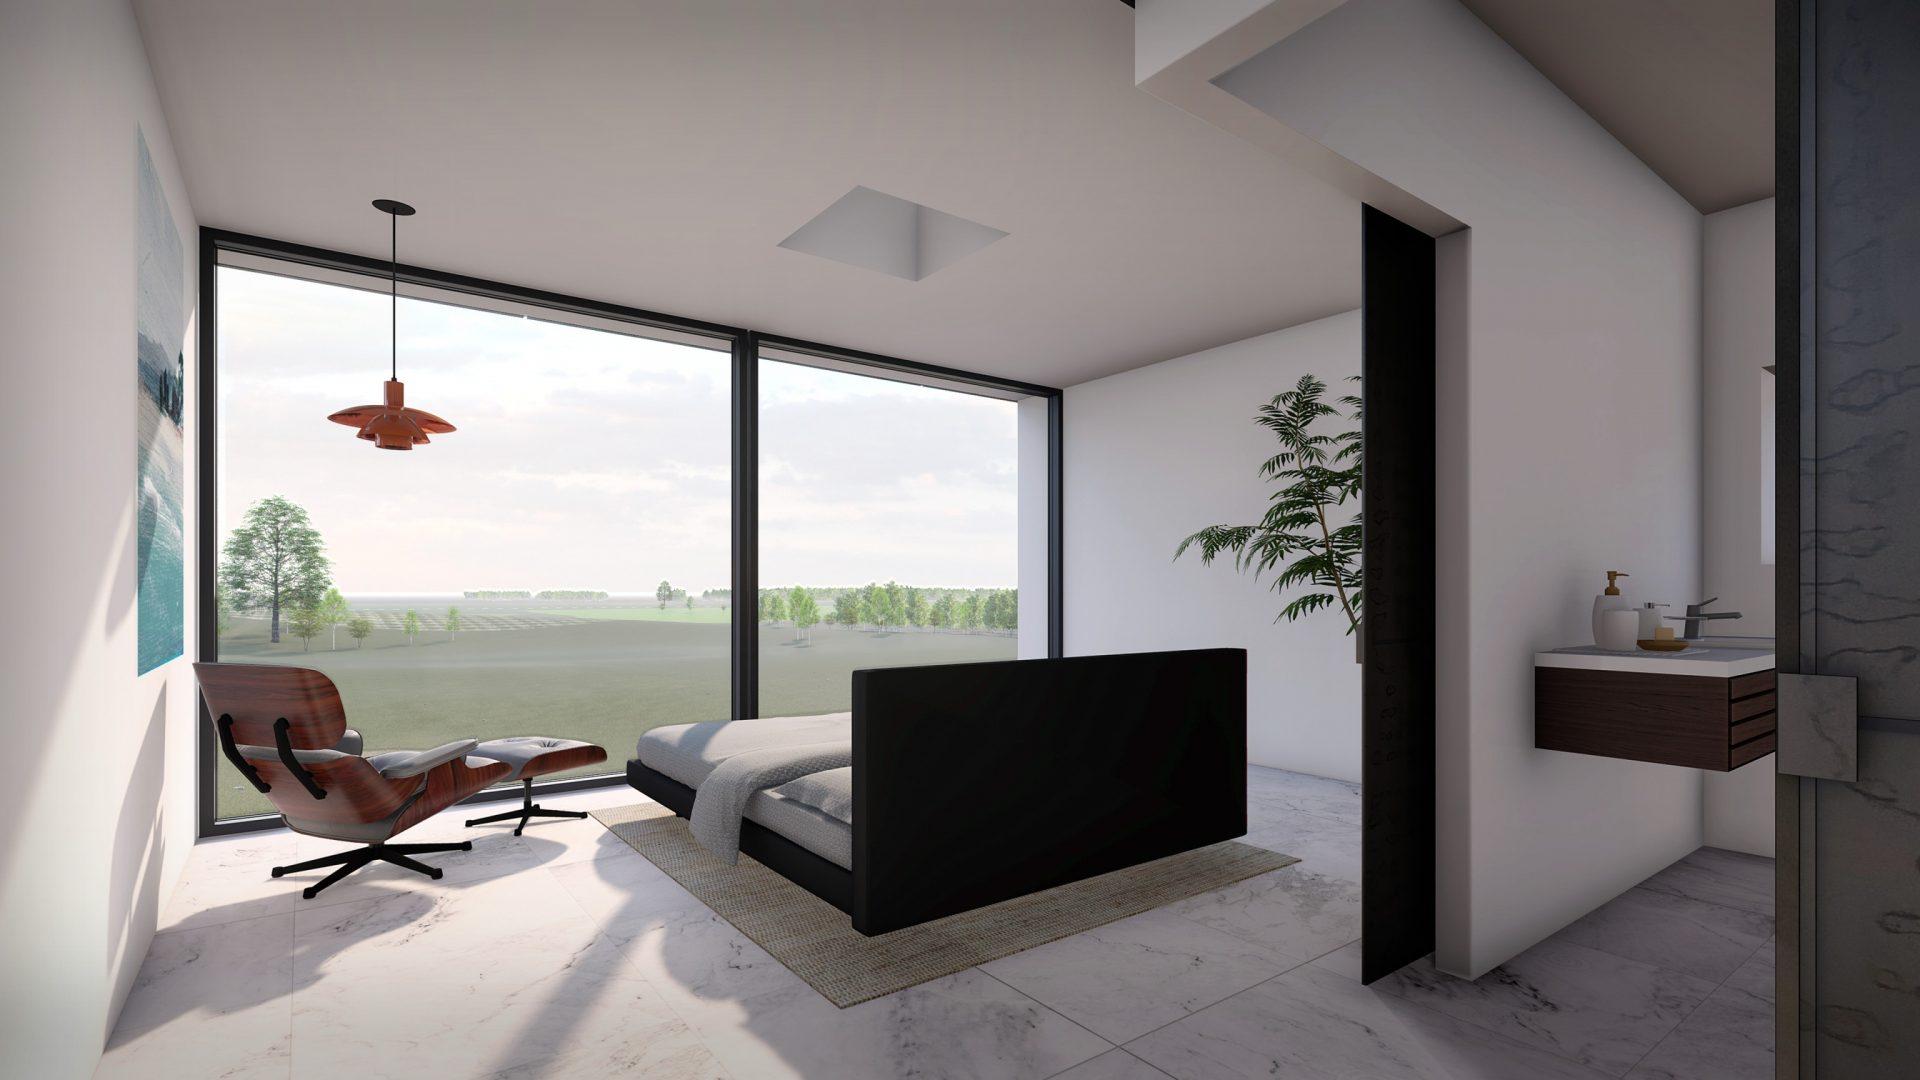 Nyt hus på Sjælland 10